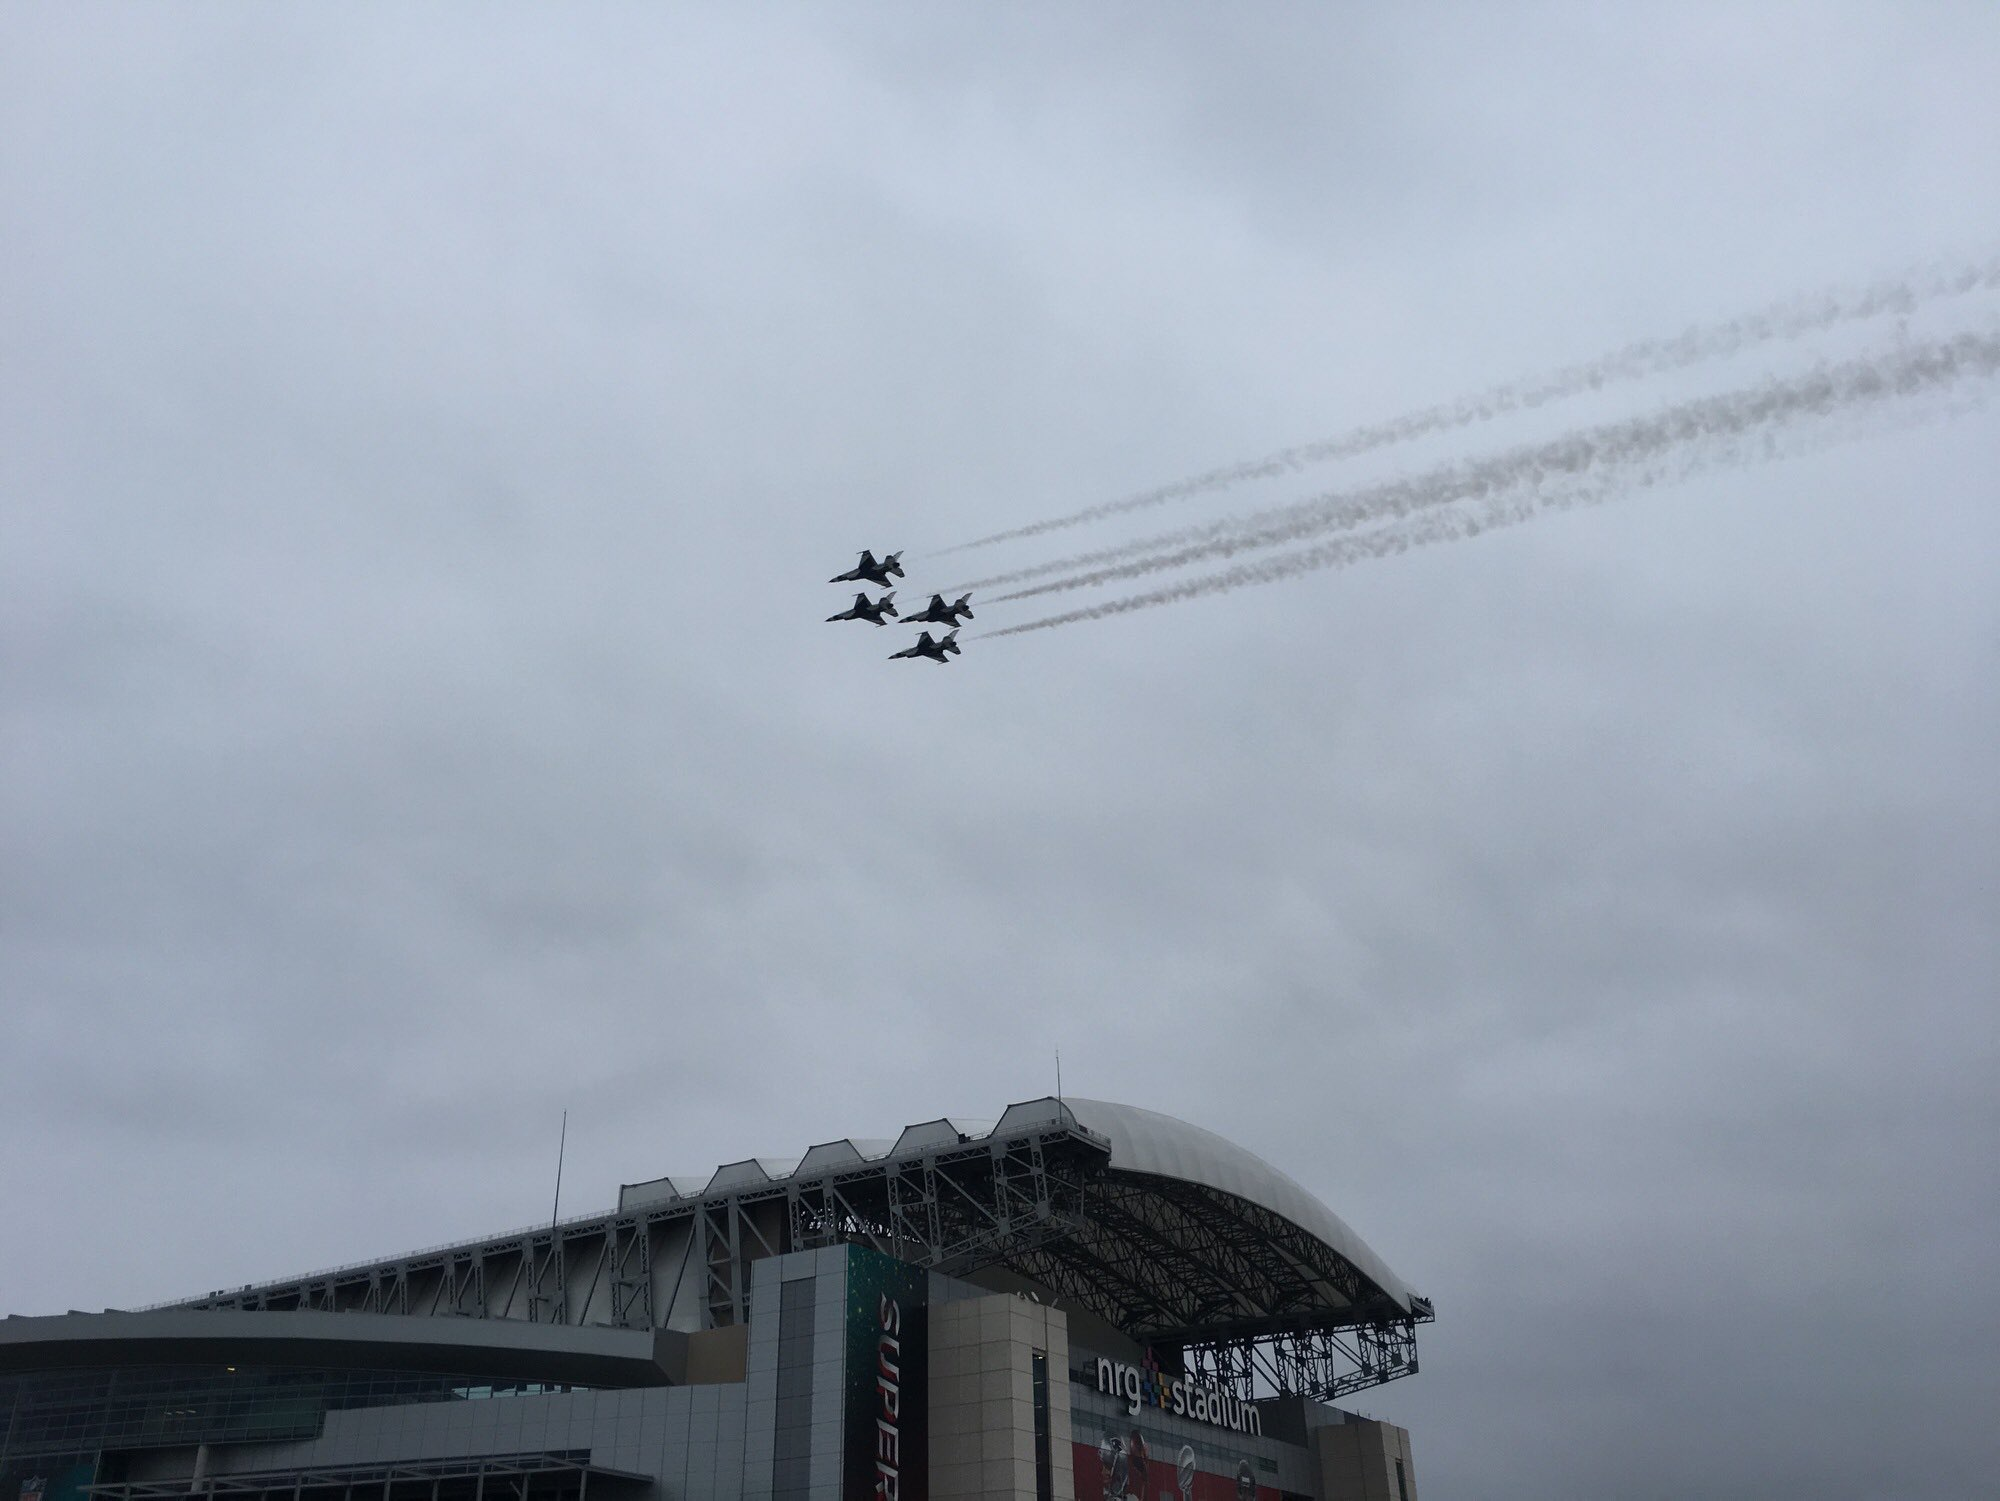 The Thunderbirds perform a practice flyover above NRG Stadium Saturday.  Photo: Phil Lipof